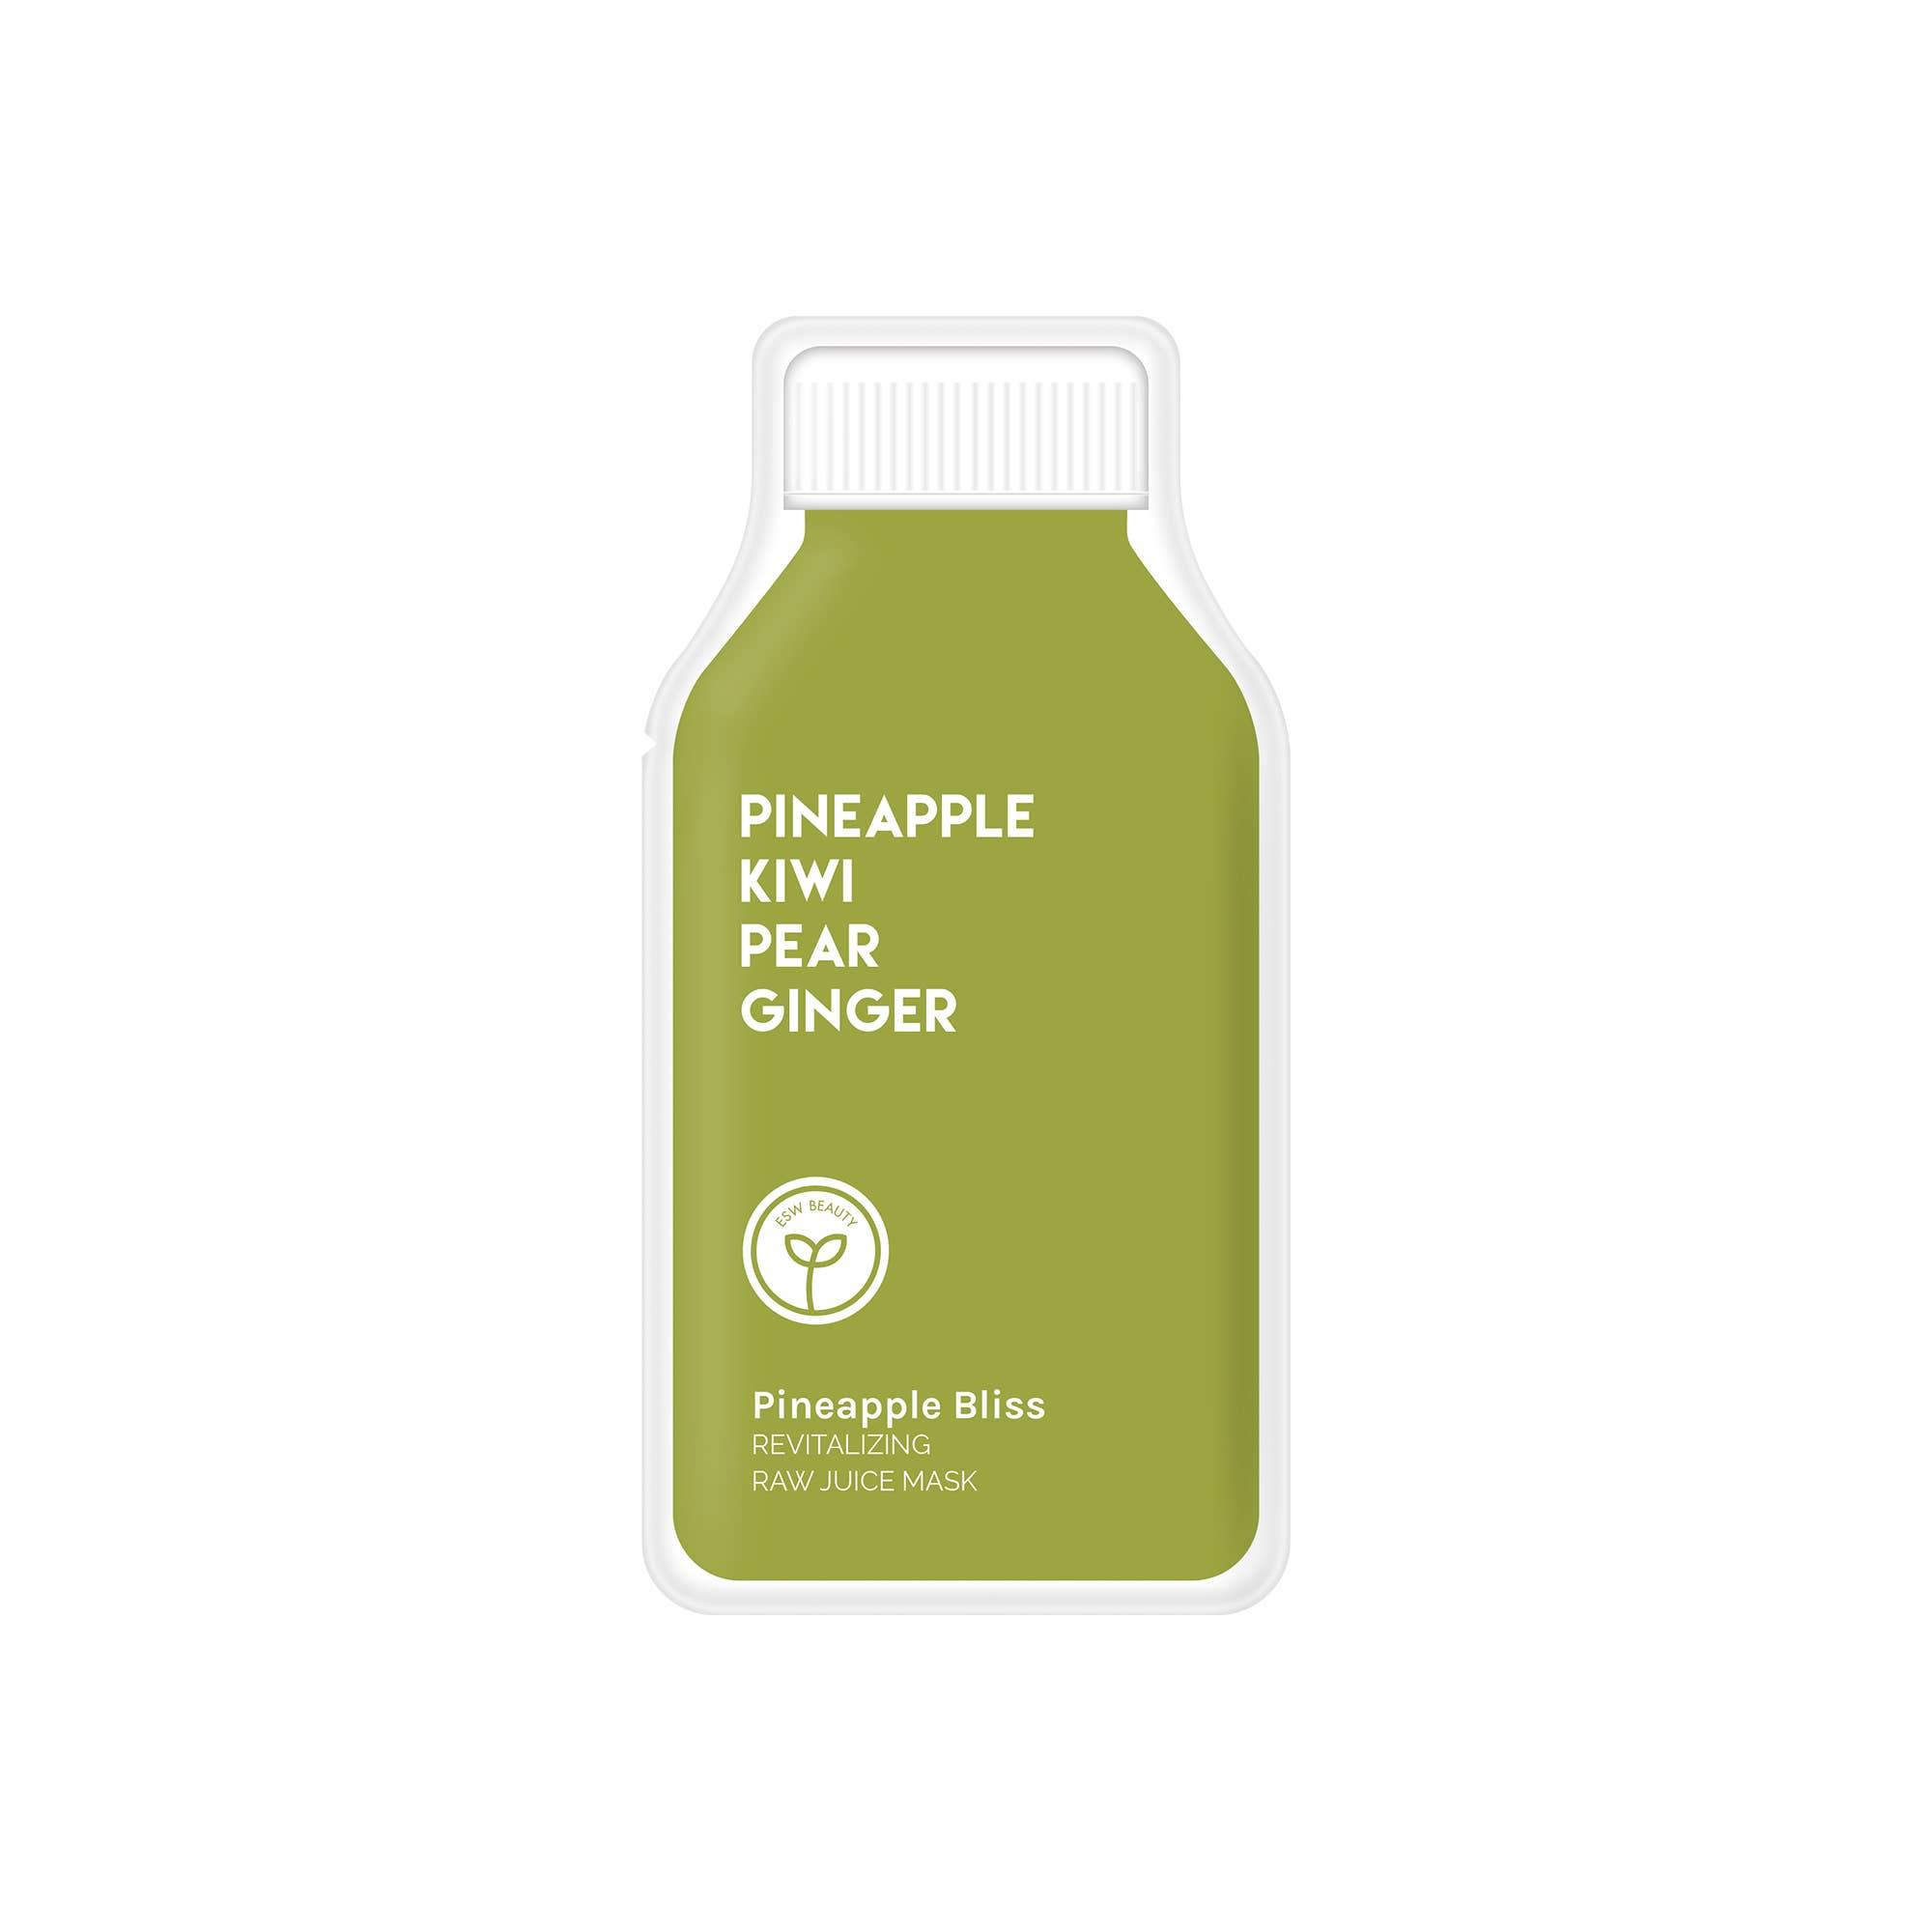 Pineapple Bliss Revitalizing Raw Juice Mask | Trada Marketplace